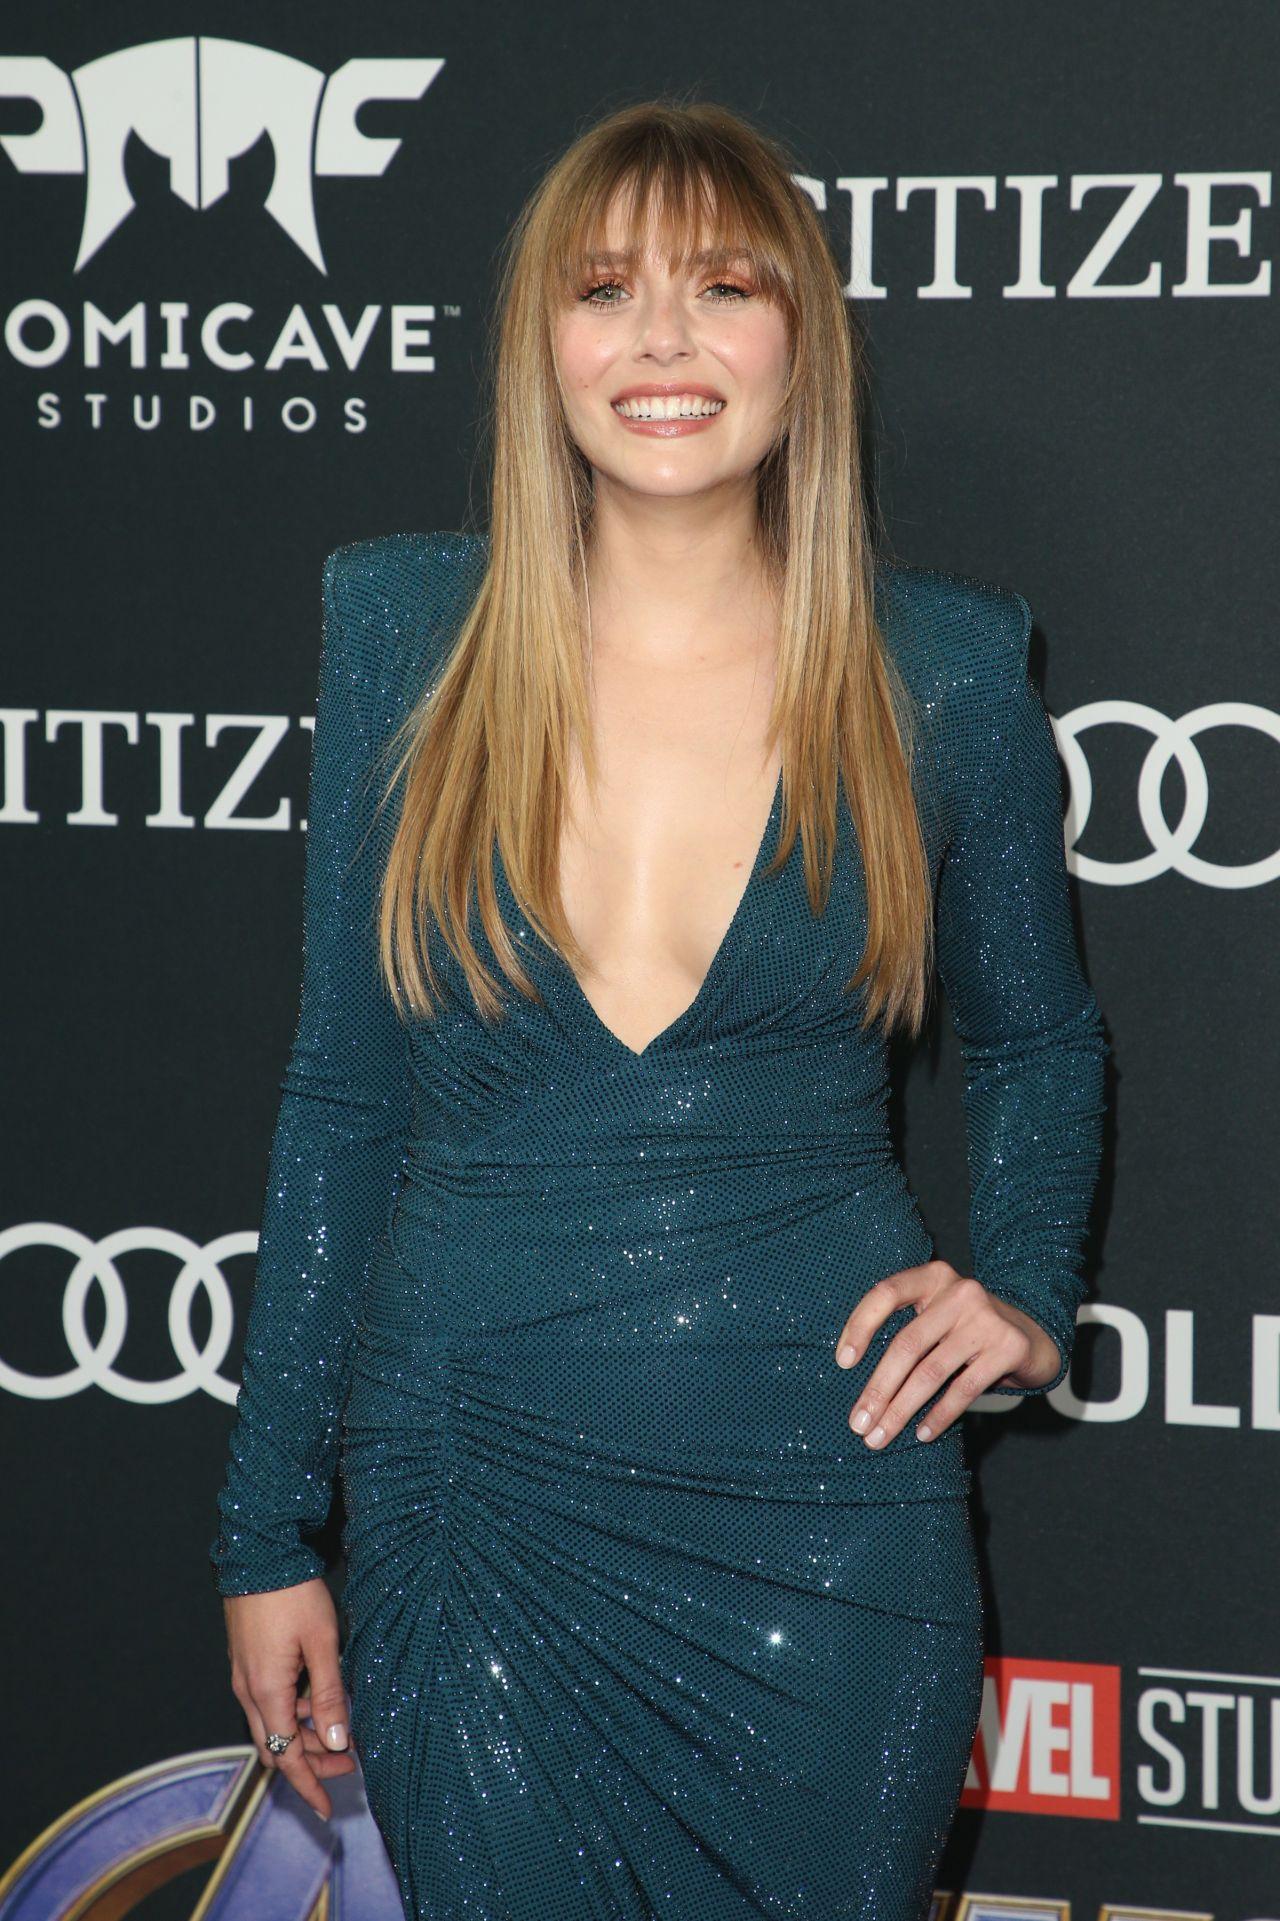 Elizabeth Olsen Avengers Endgame Premiere In La